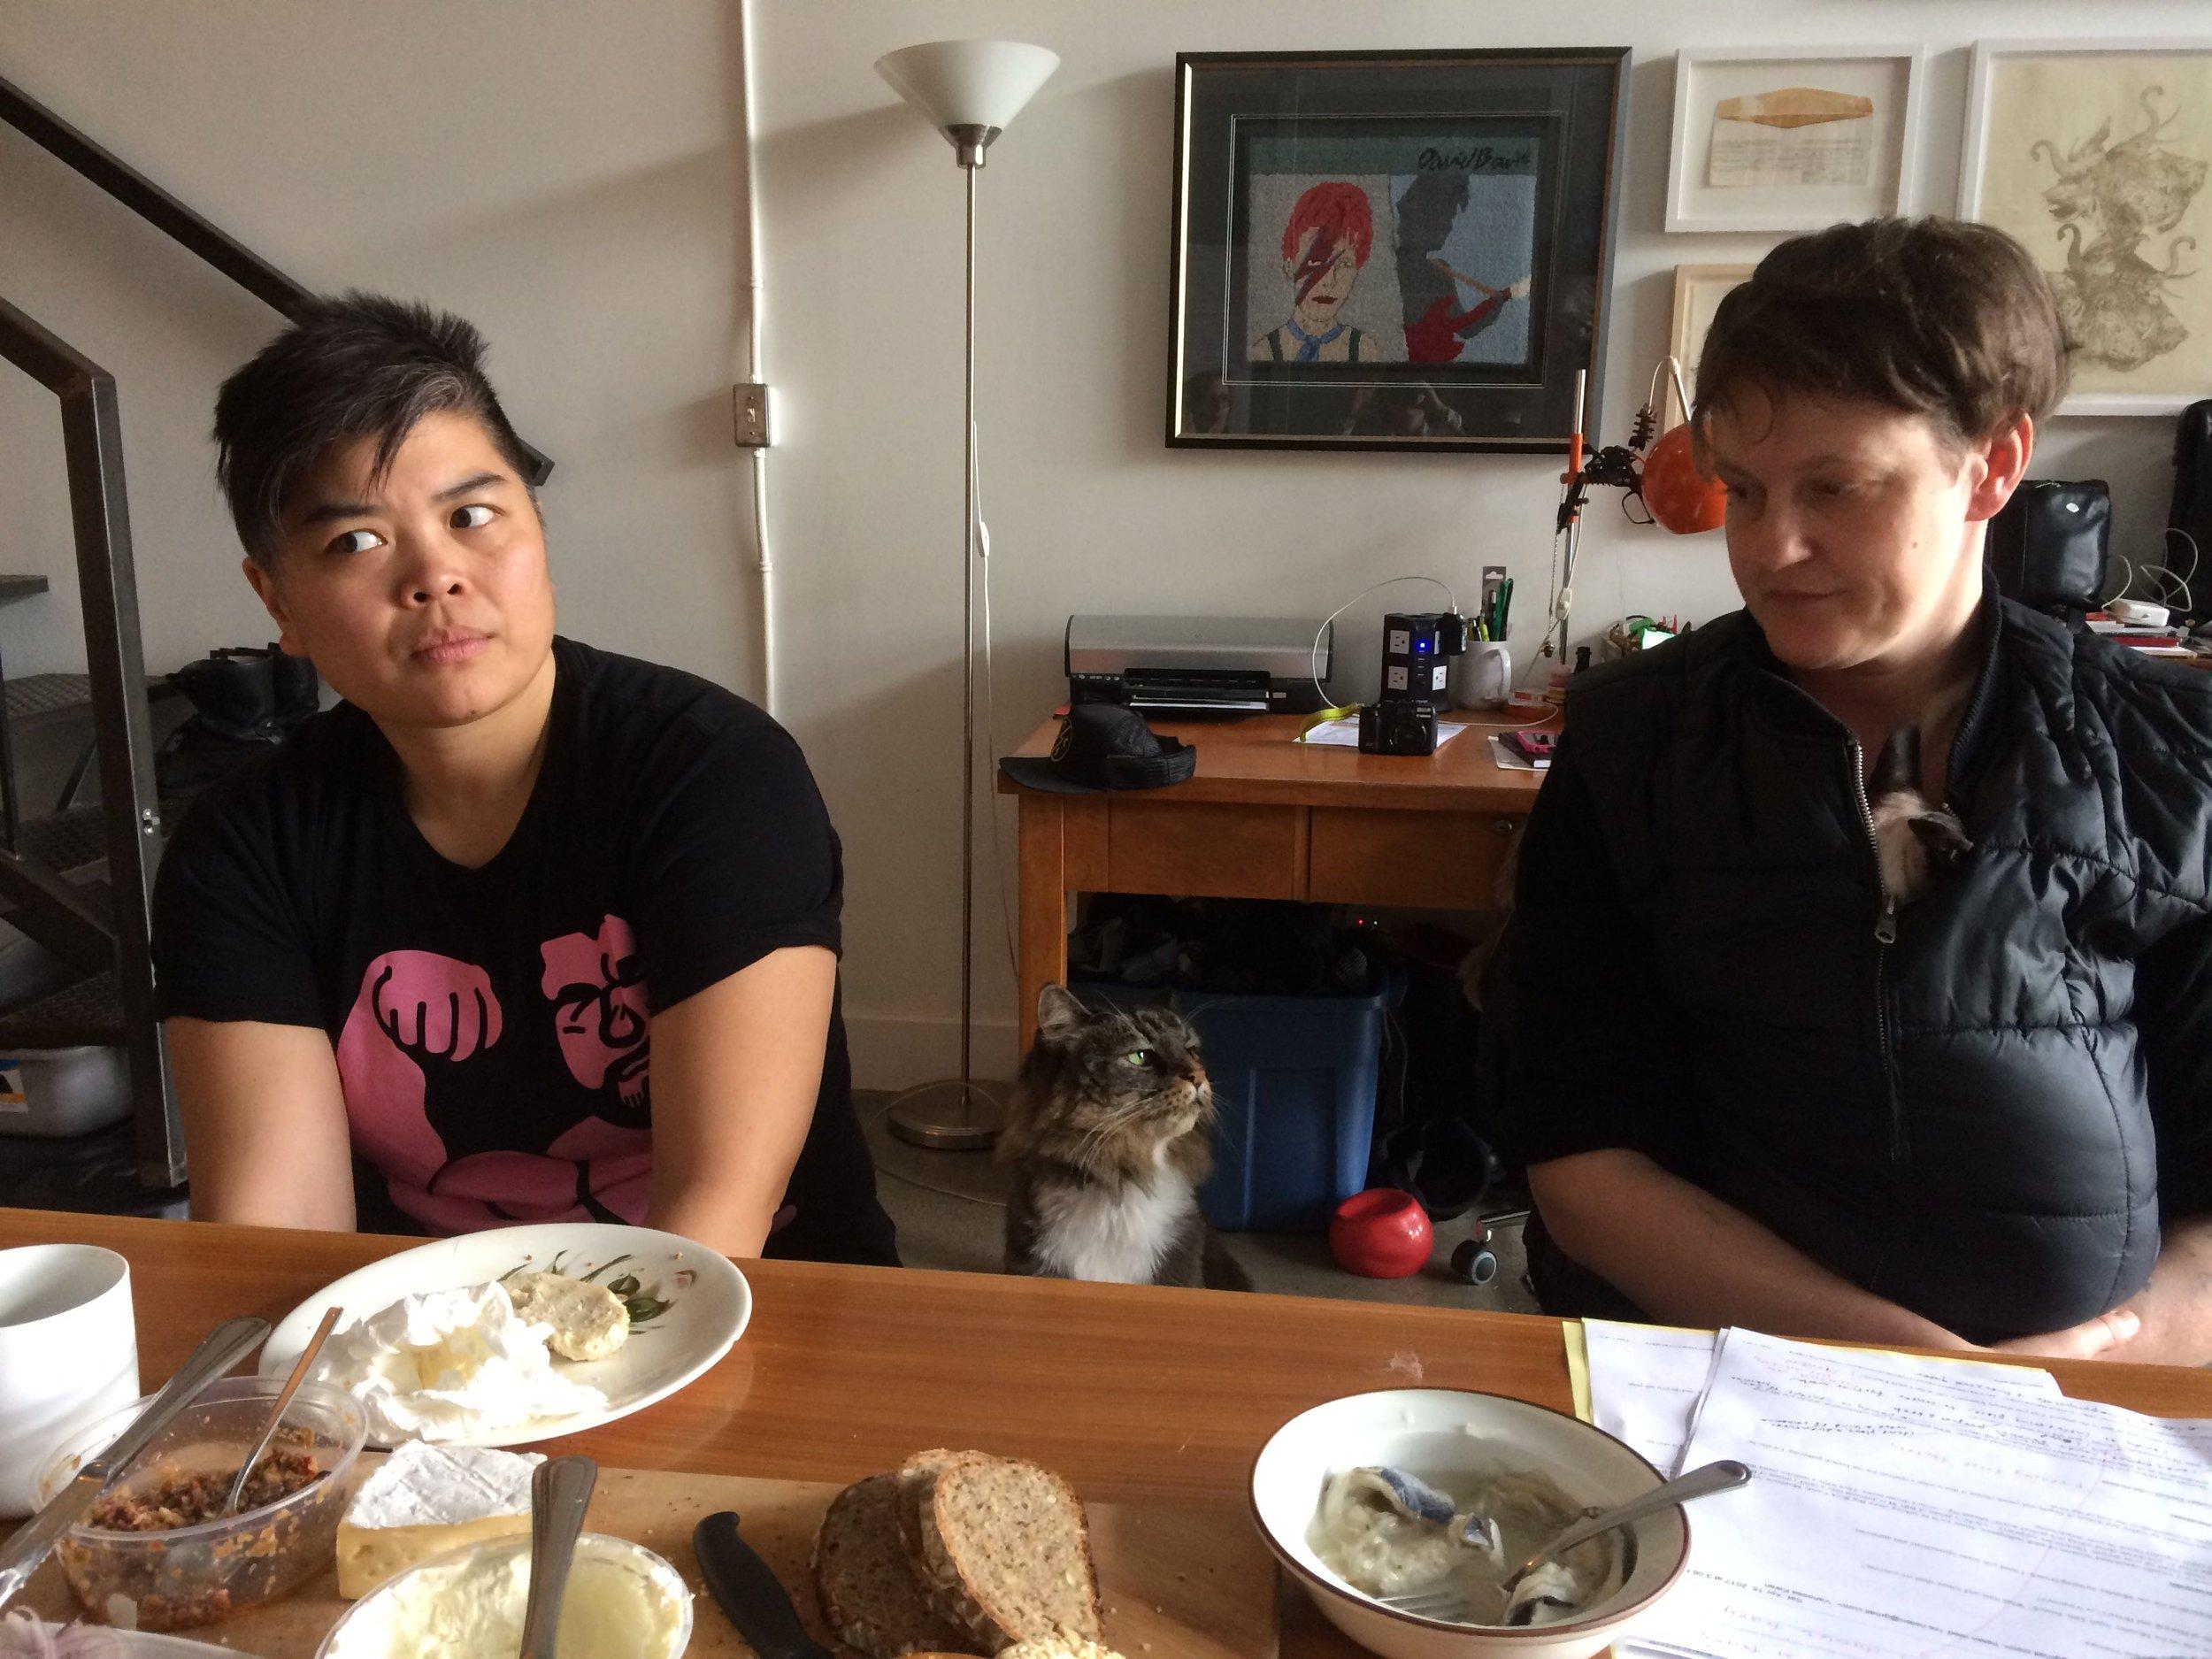 Vanessa Kwan and Hannah Jickling preparing brunch, April 24, 2017. Photo by Liz Park